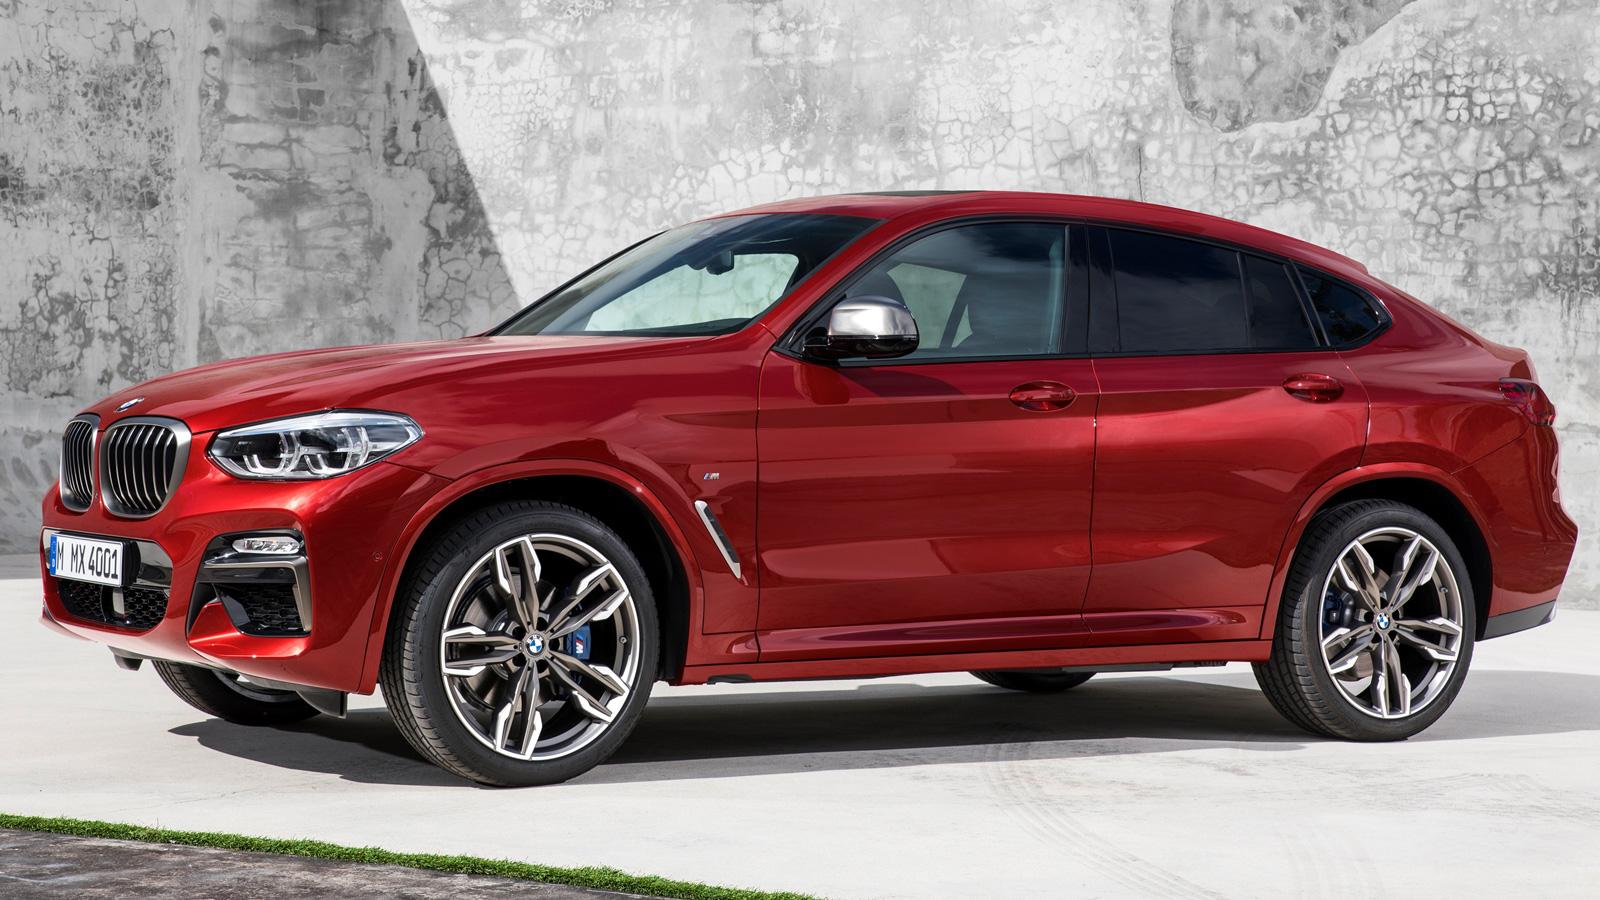 Новый BMW X4 2019 | фото, цена, характеристики новые фото